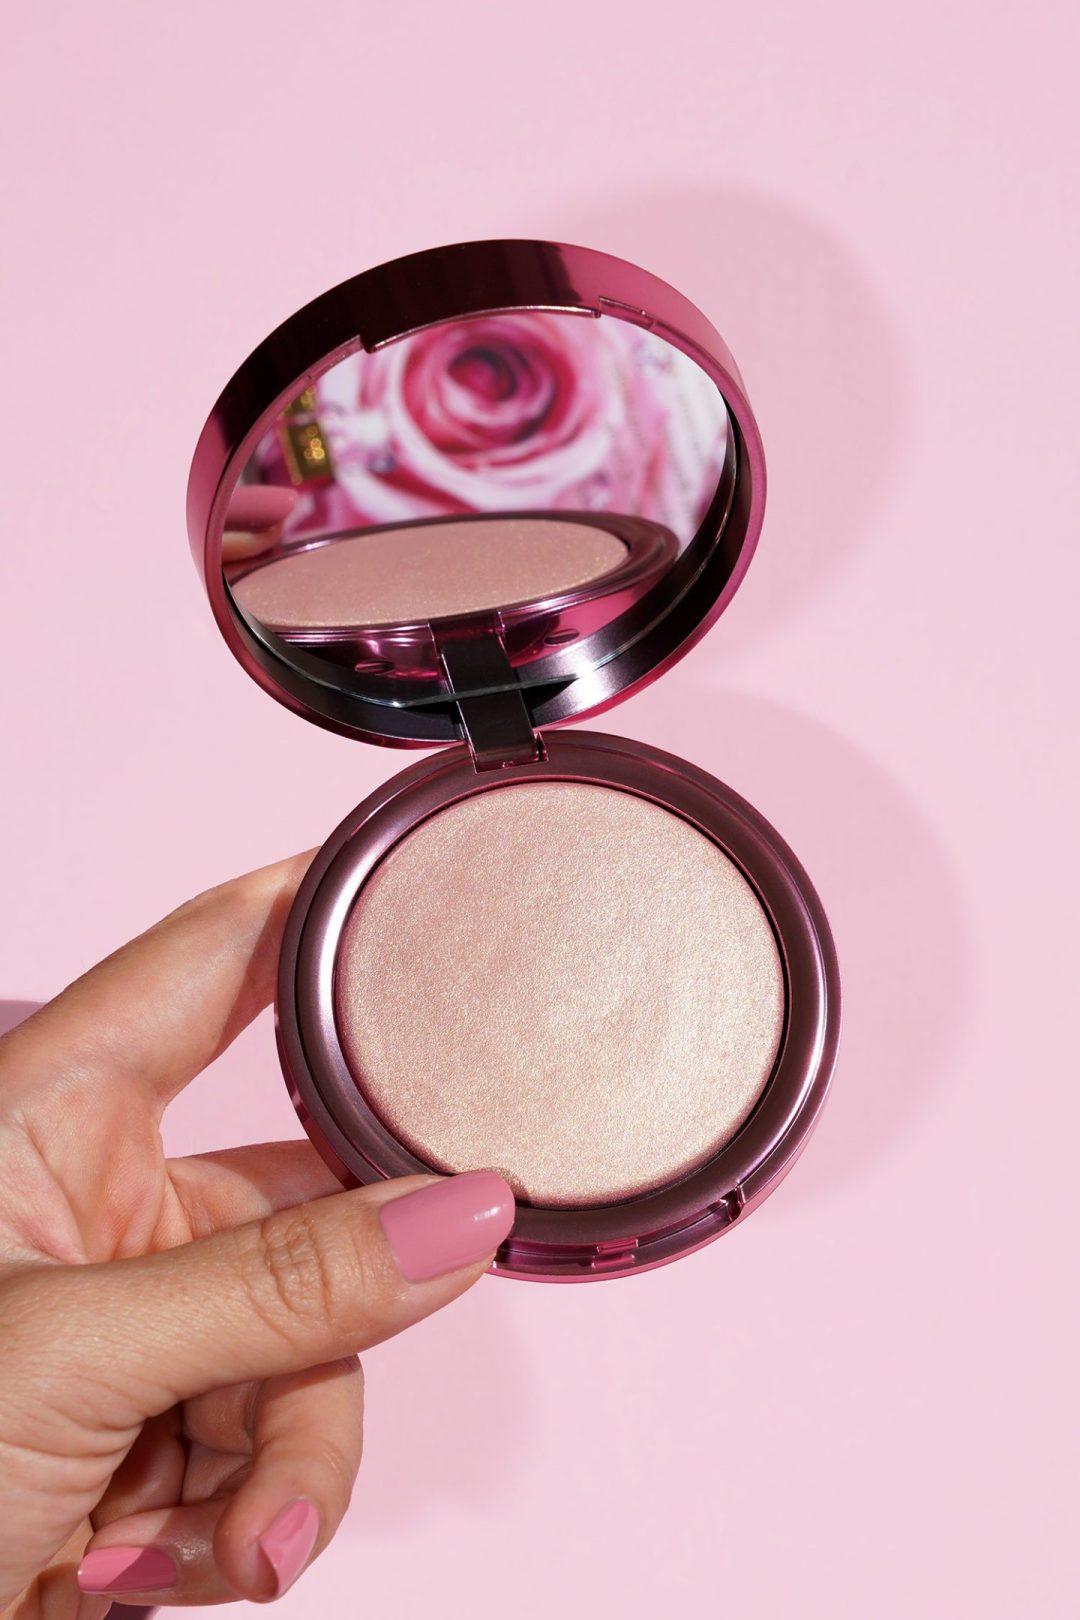 Pat McGrath Divine Rose Skin Fetish Ultra Glow Highlighter